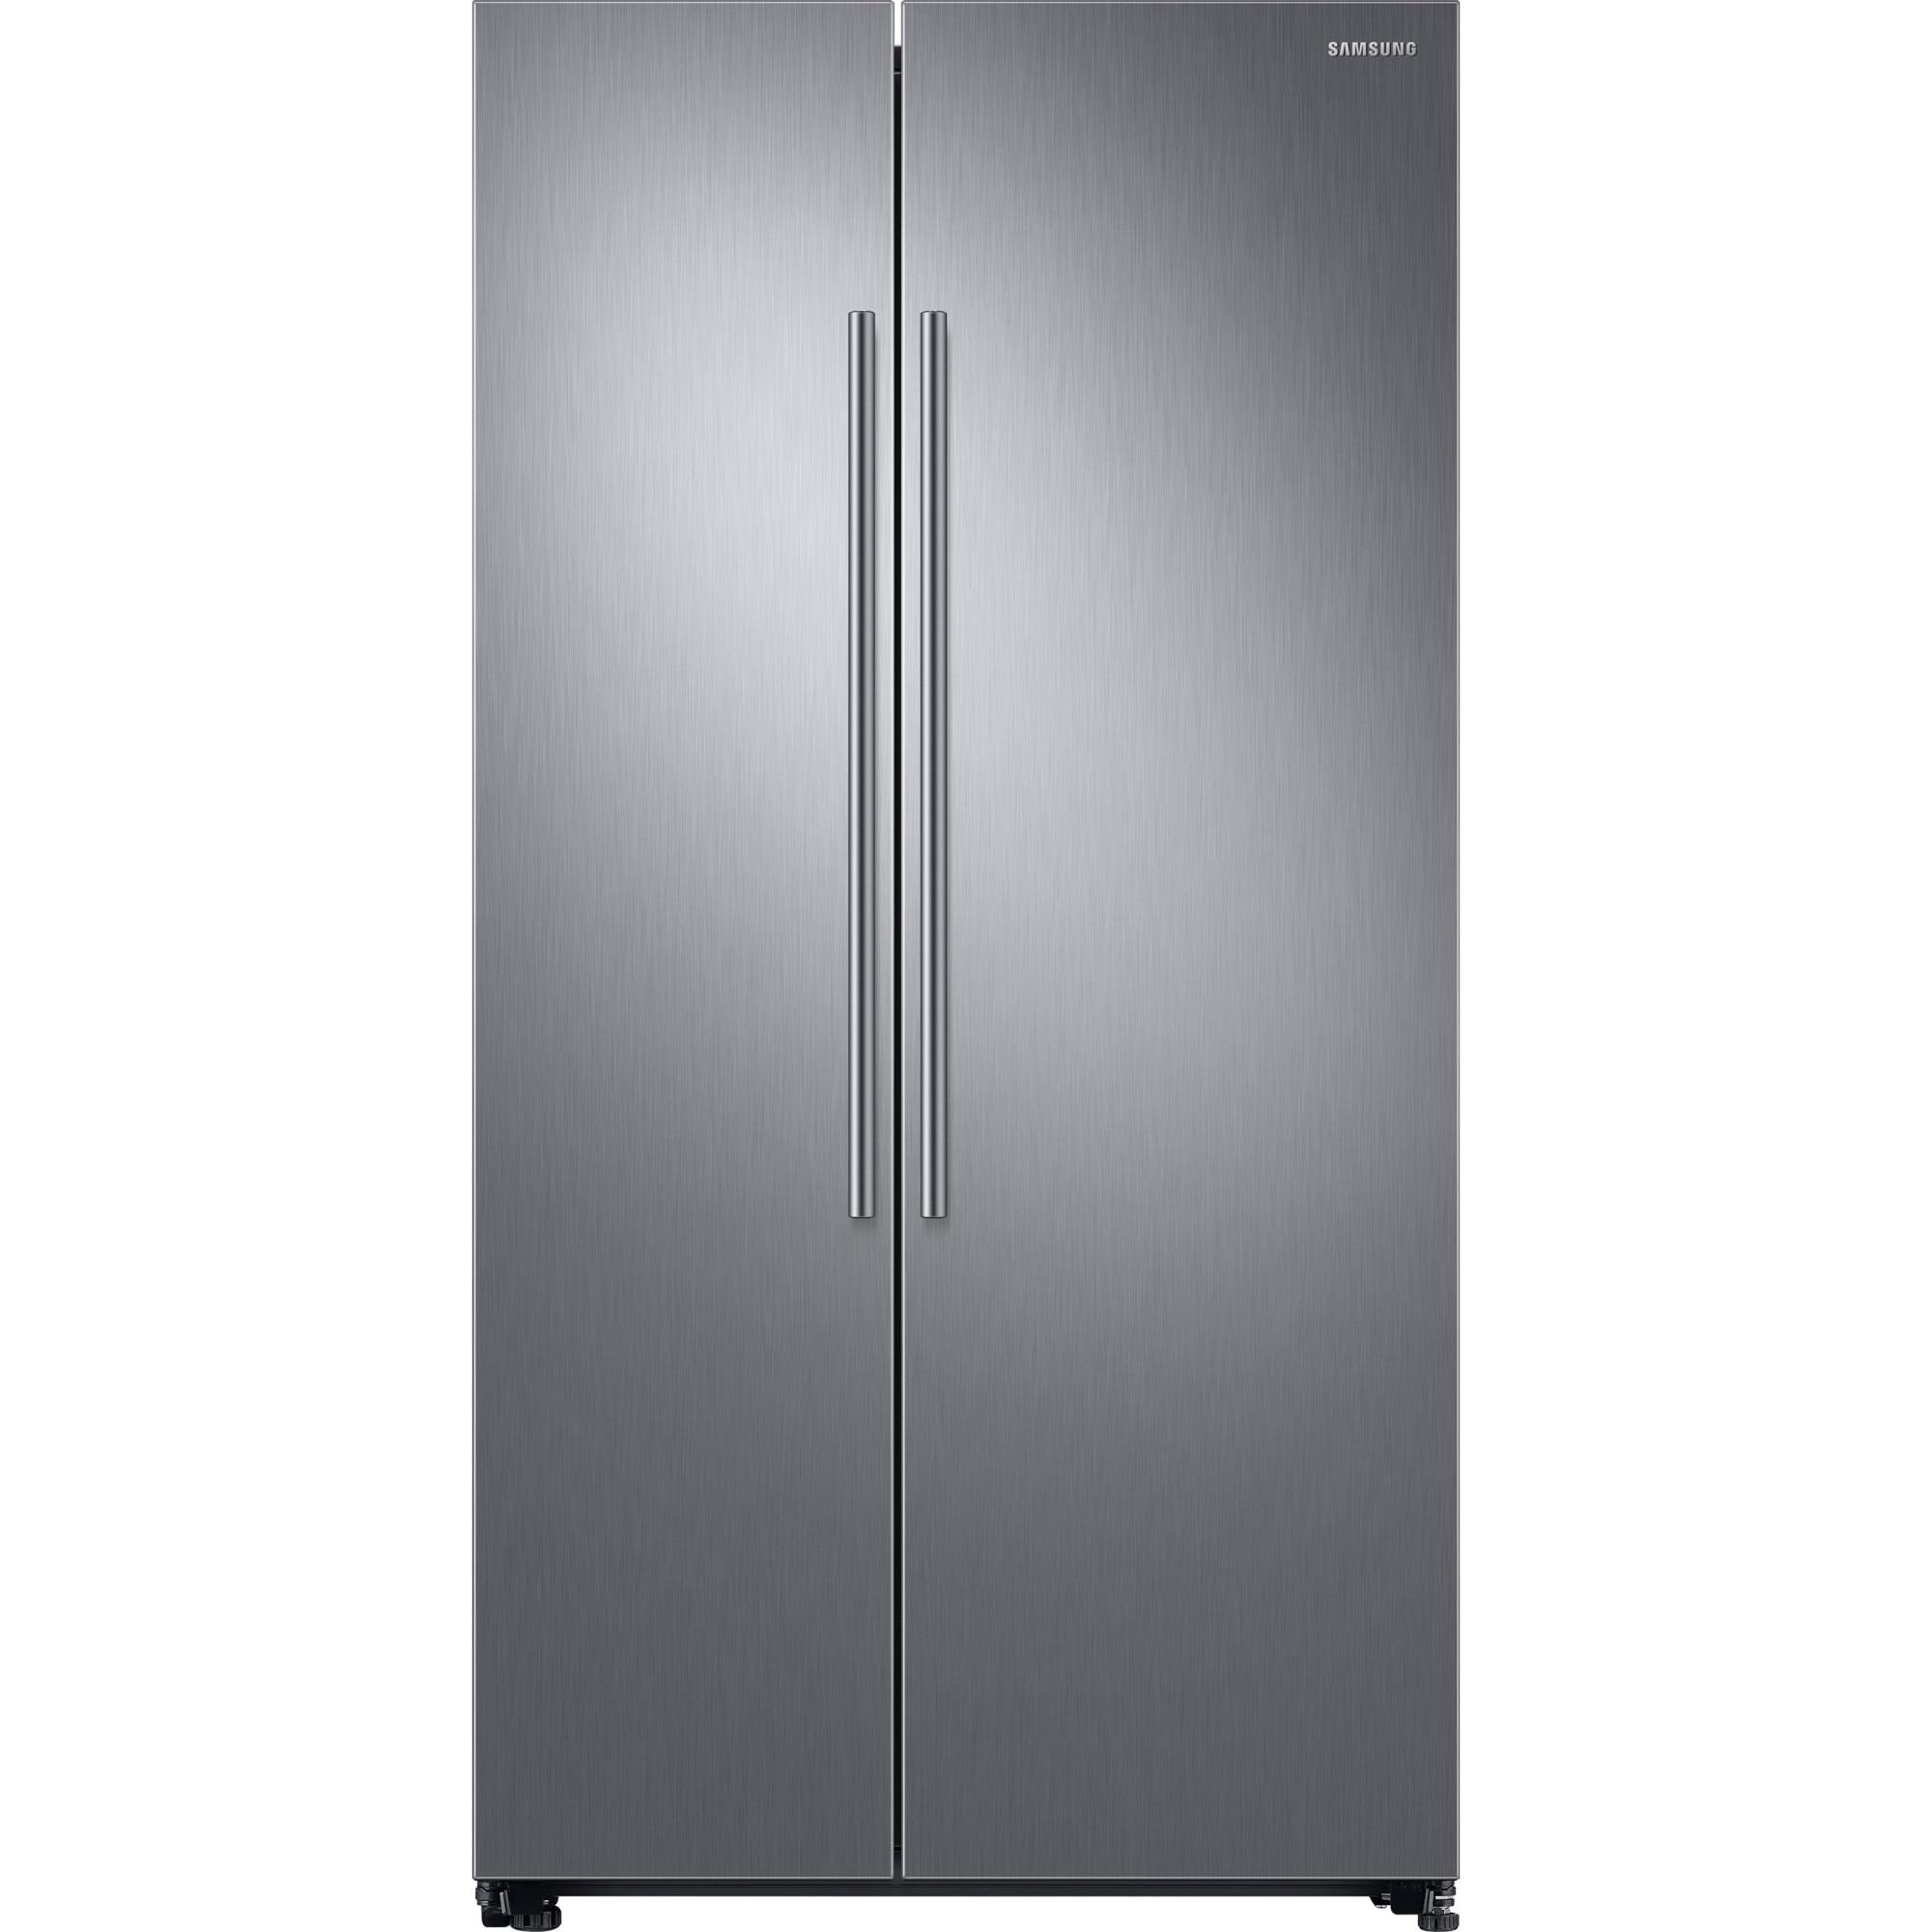 Side by side хладилник Samsung RS66N8100S9/EF